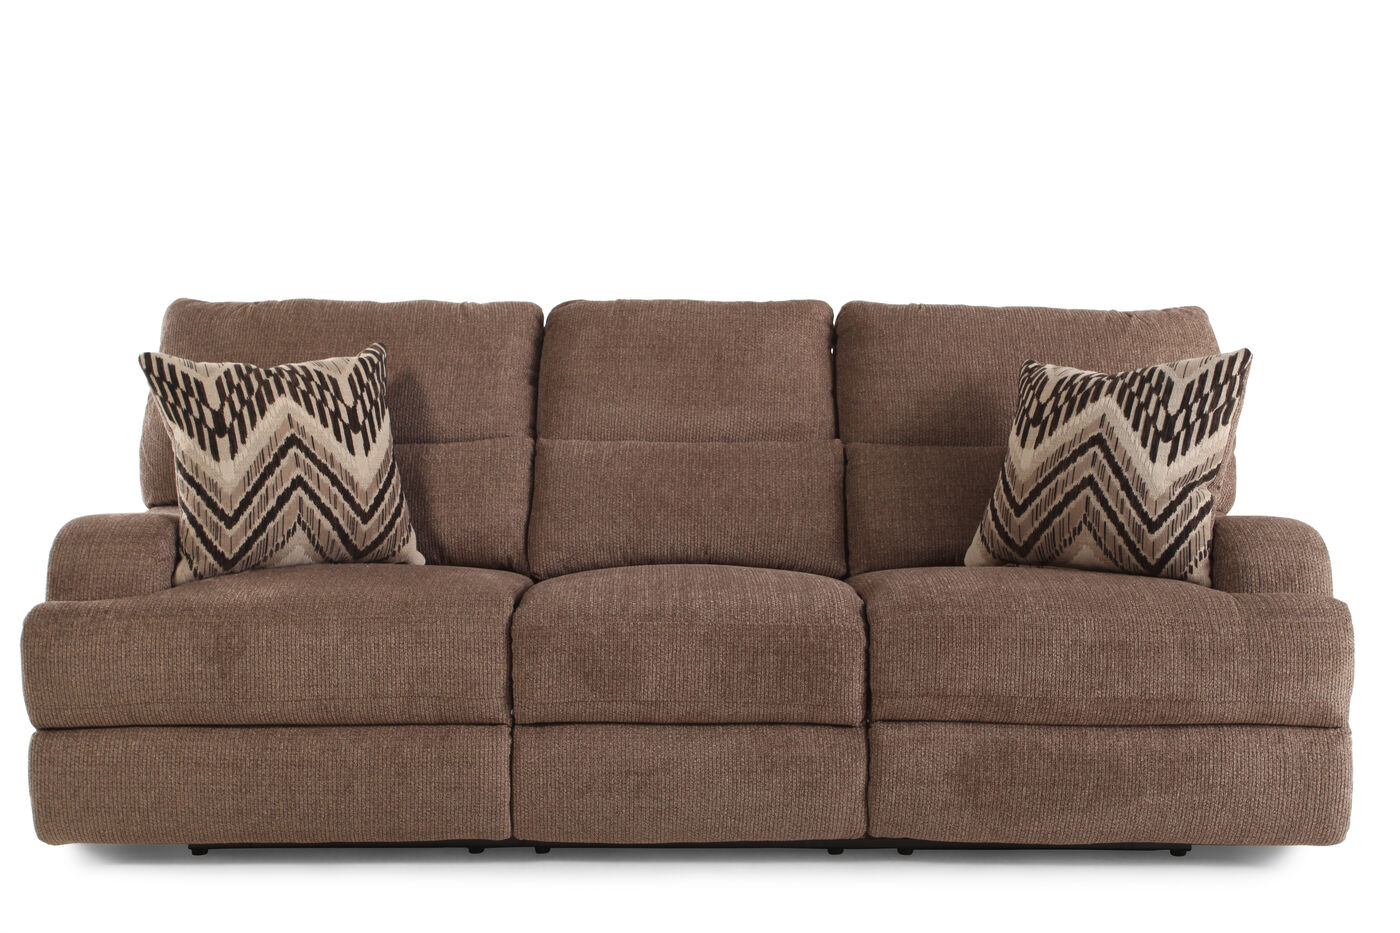 Verona frenzy power sofa